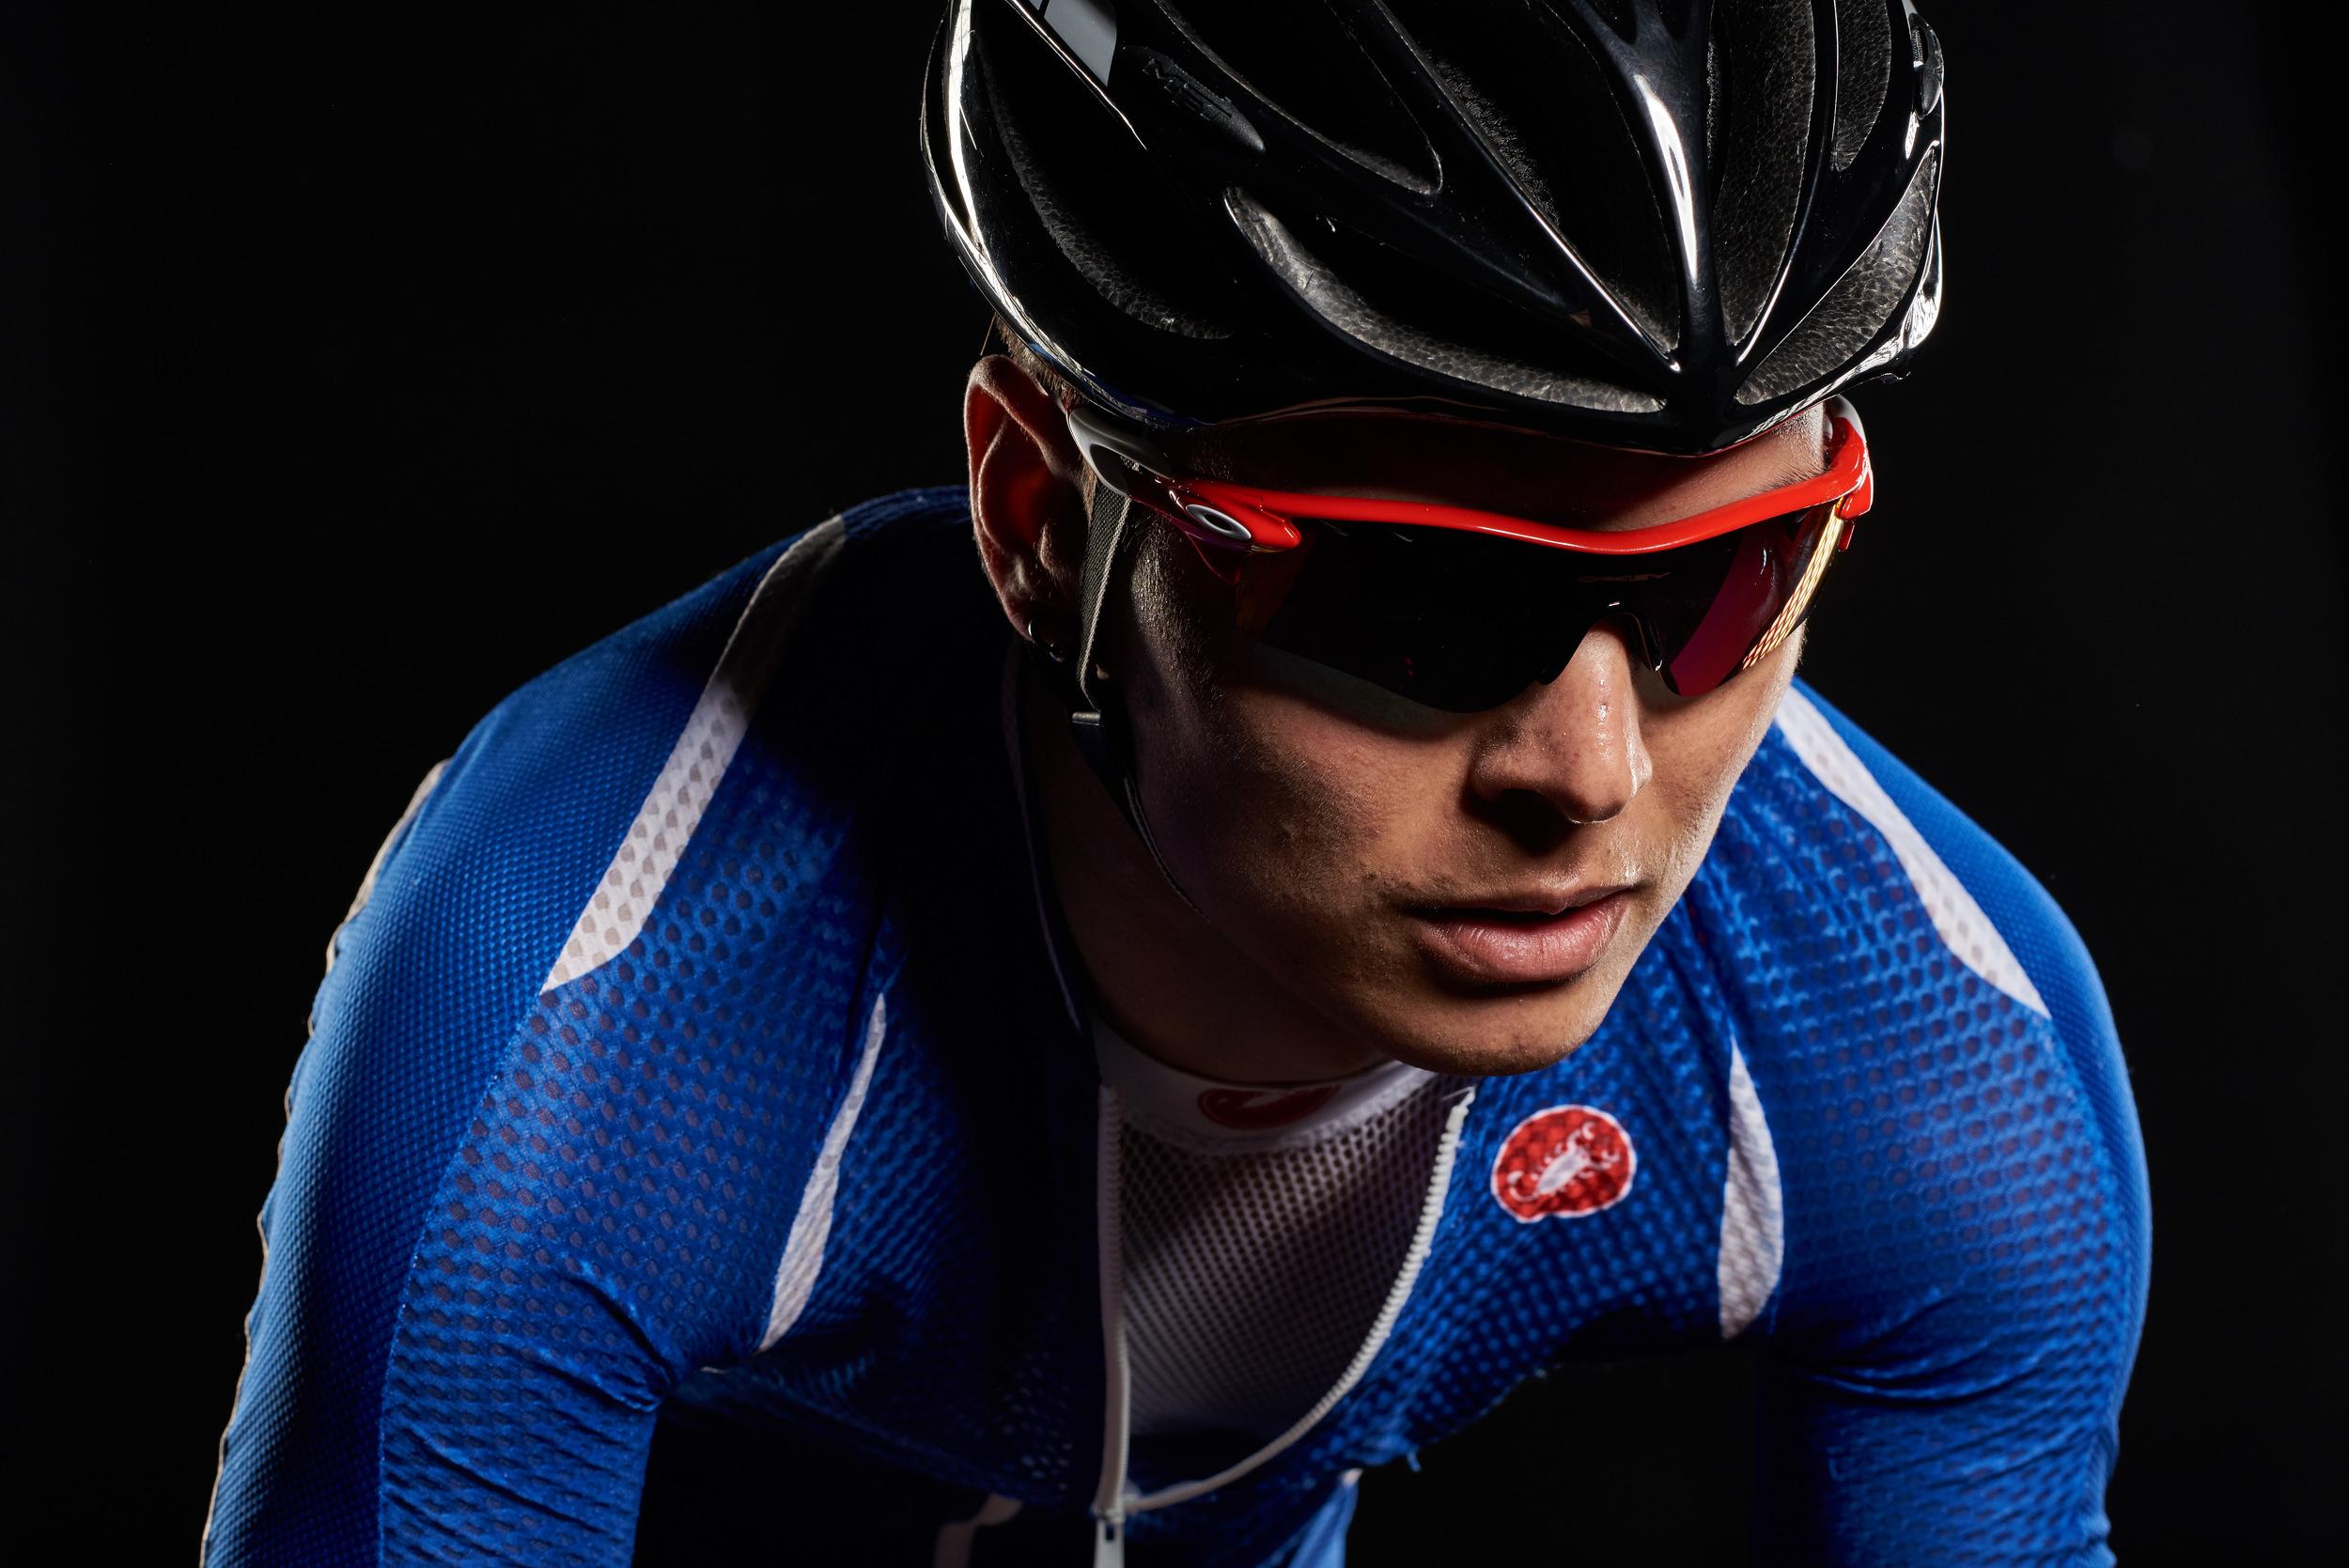 MEC_Road_Cycling_Studio_0125.jpg